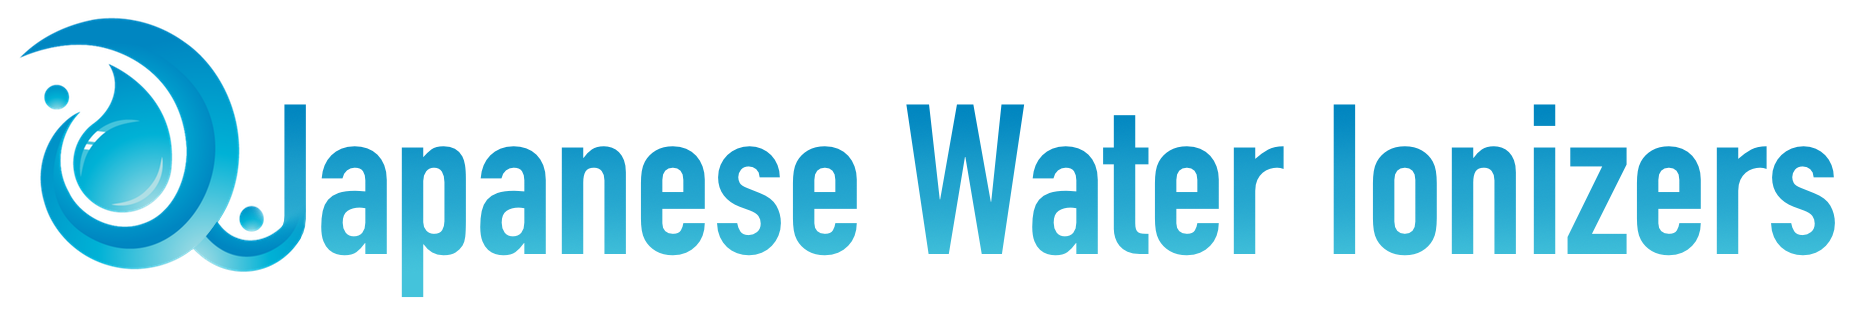 Japanese Microwater Ionizer – Alkaline Water Ionizer | Japanese Water Ionizers